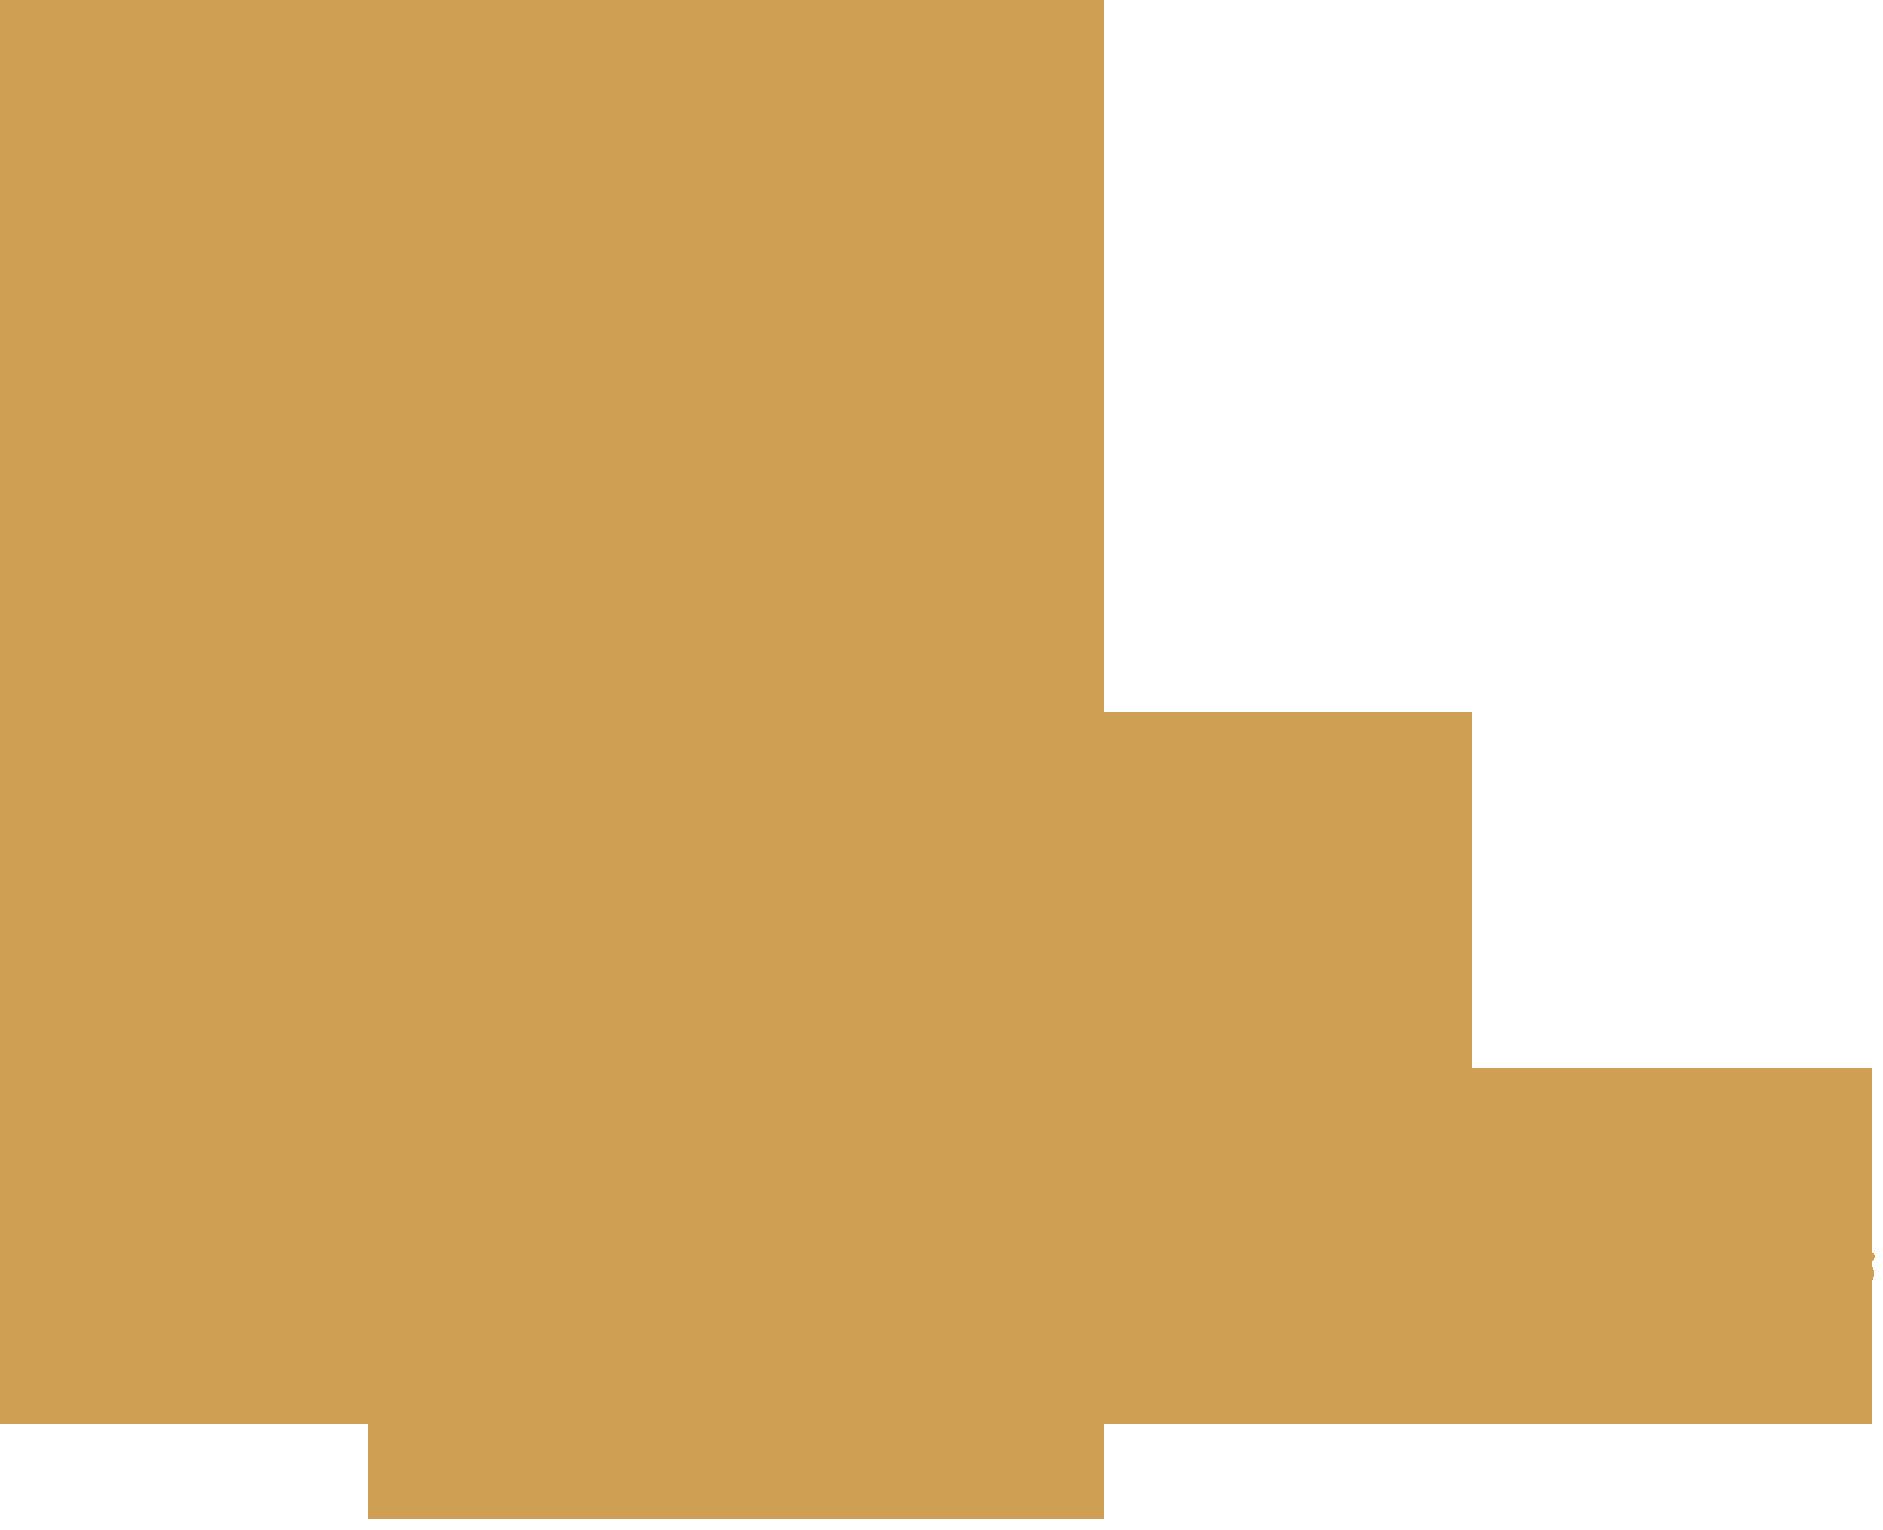 DMC Denmark map